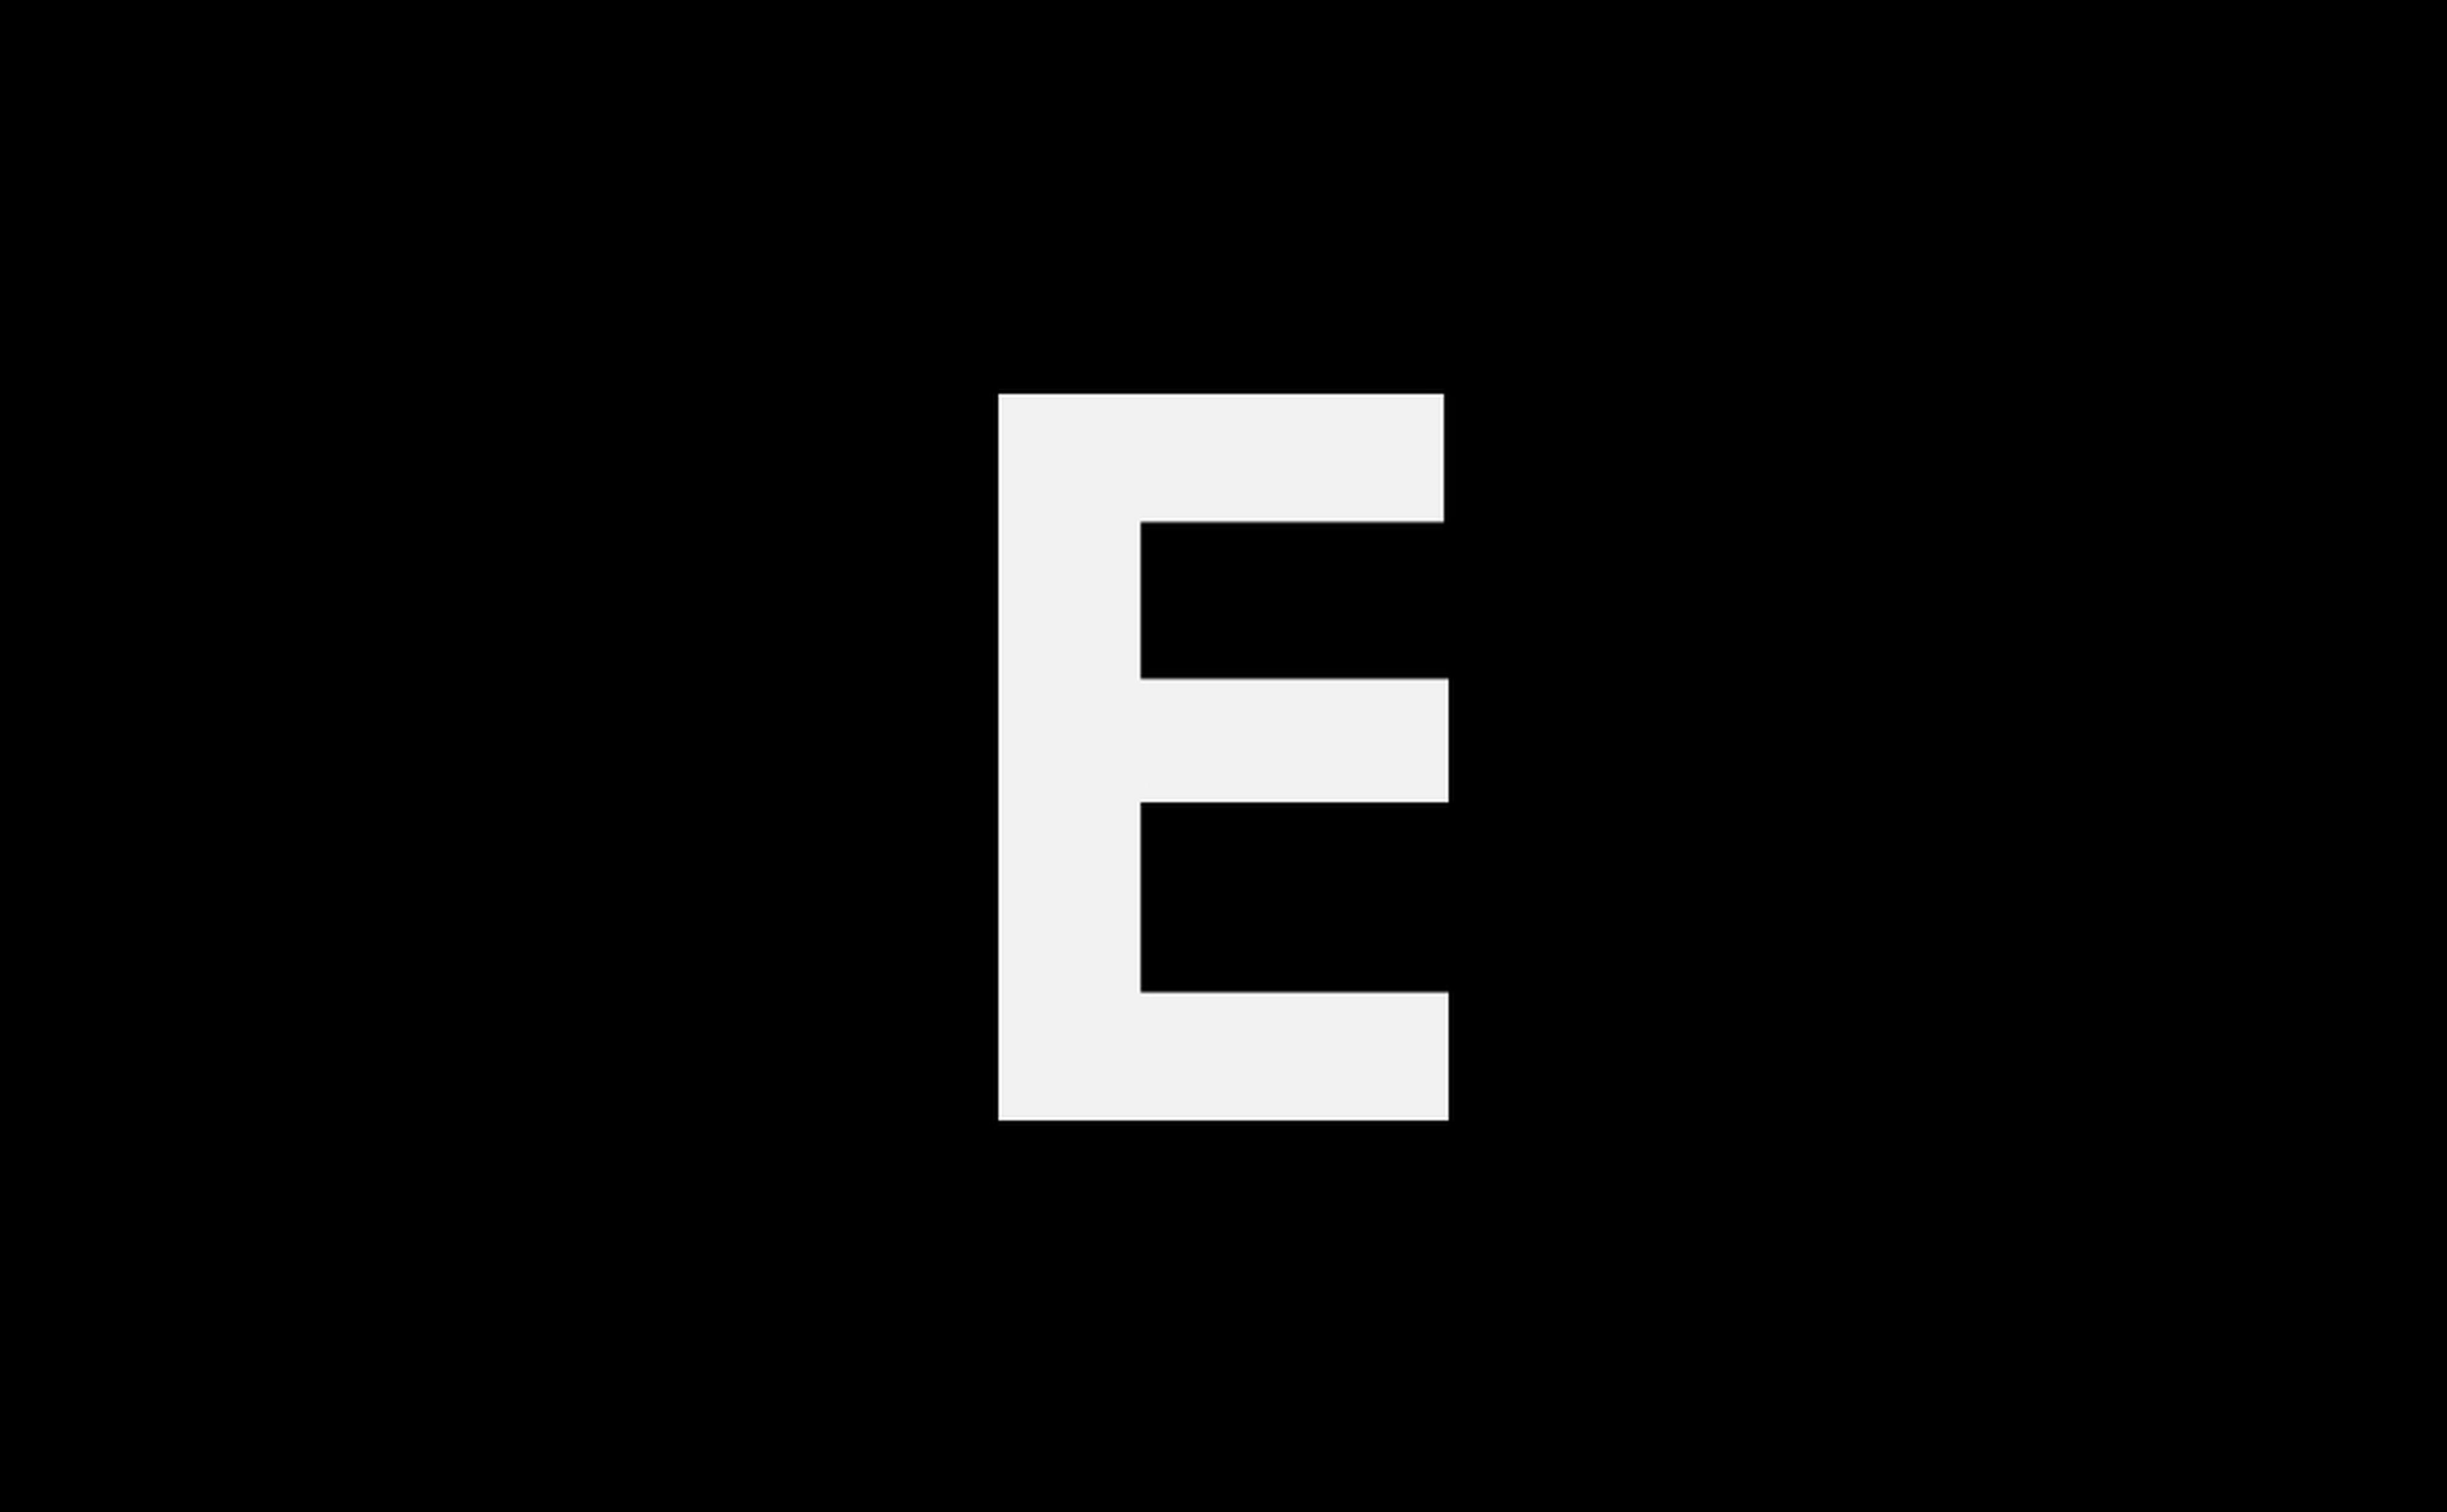 one animal, animal themes, close-up, mammal, horse, domestic animals, eyelash, animal head, human eye, one person, real people, eyesight, eyeball, focus on foreground, dog, day, sensory perception, outdoors, human body part, looking at camera, portrait, pets, iris - eye, eyebrow